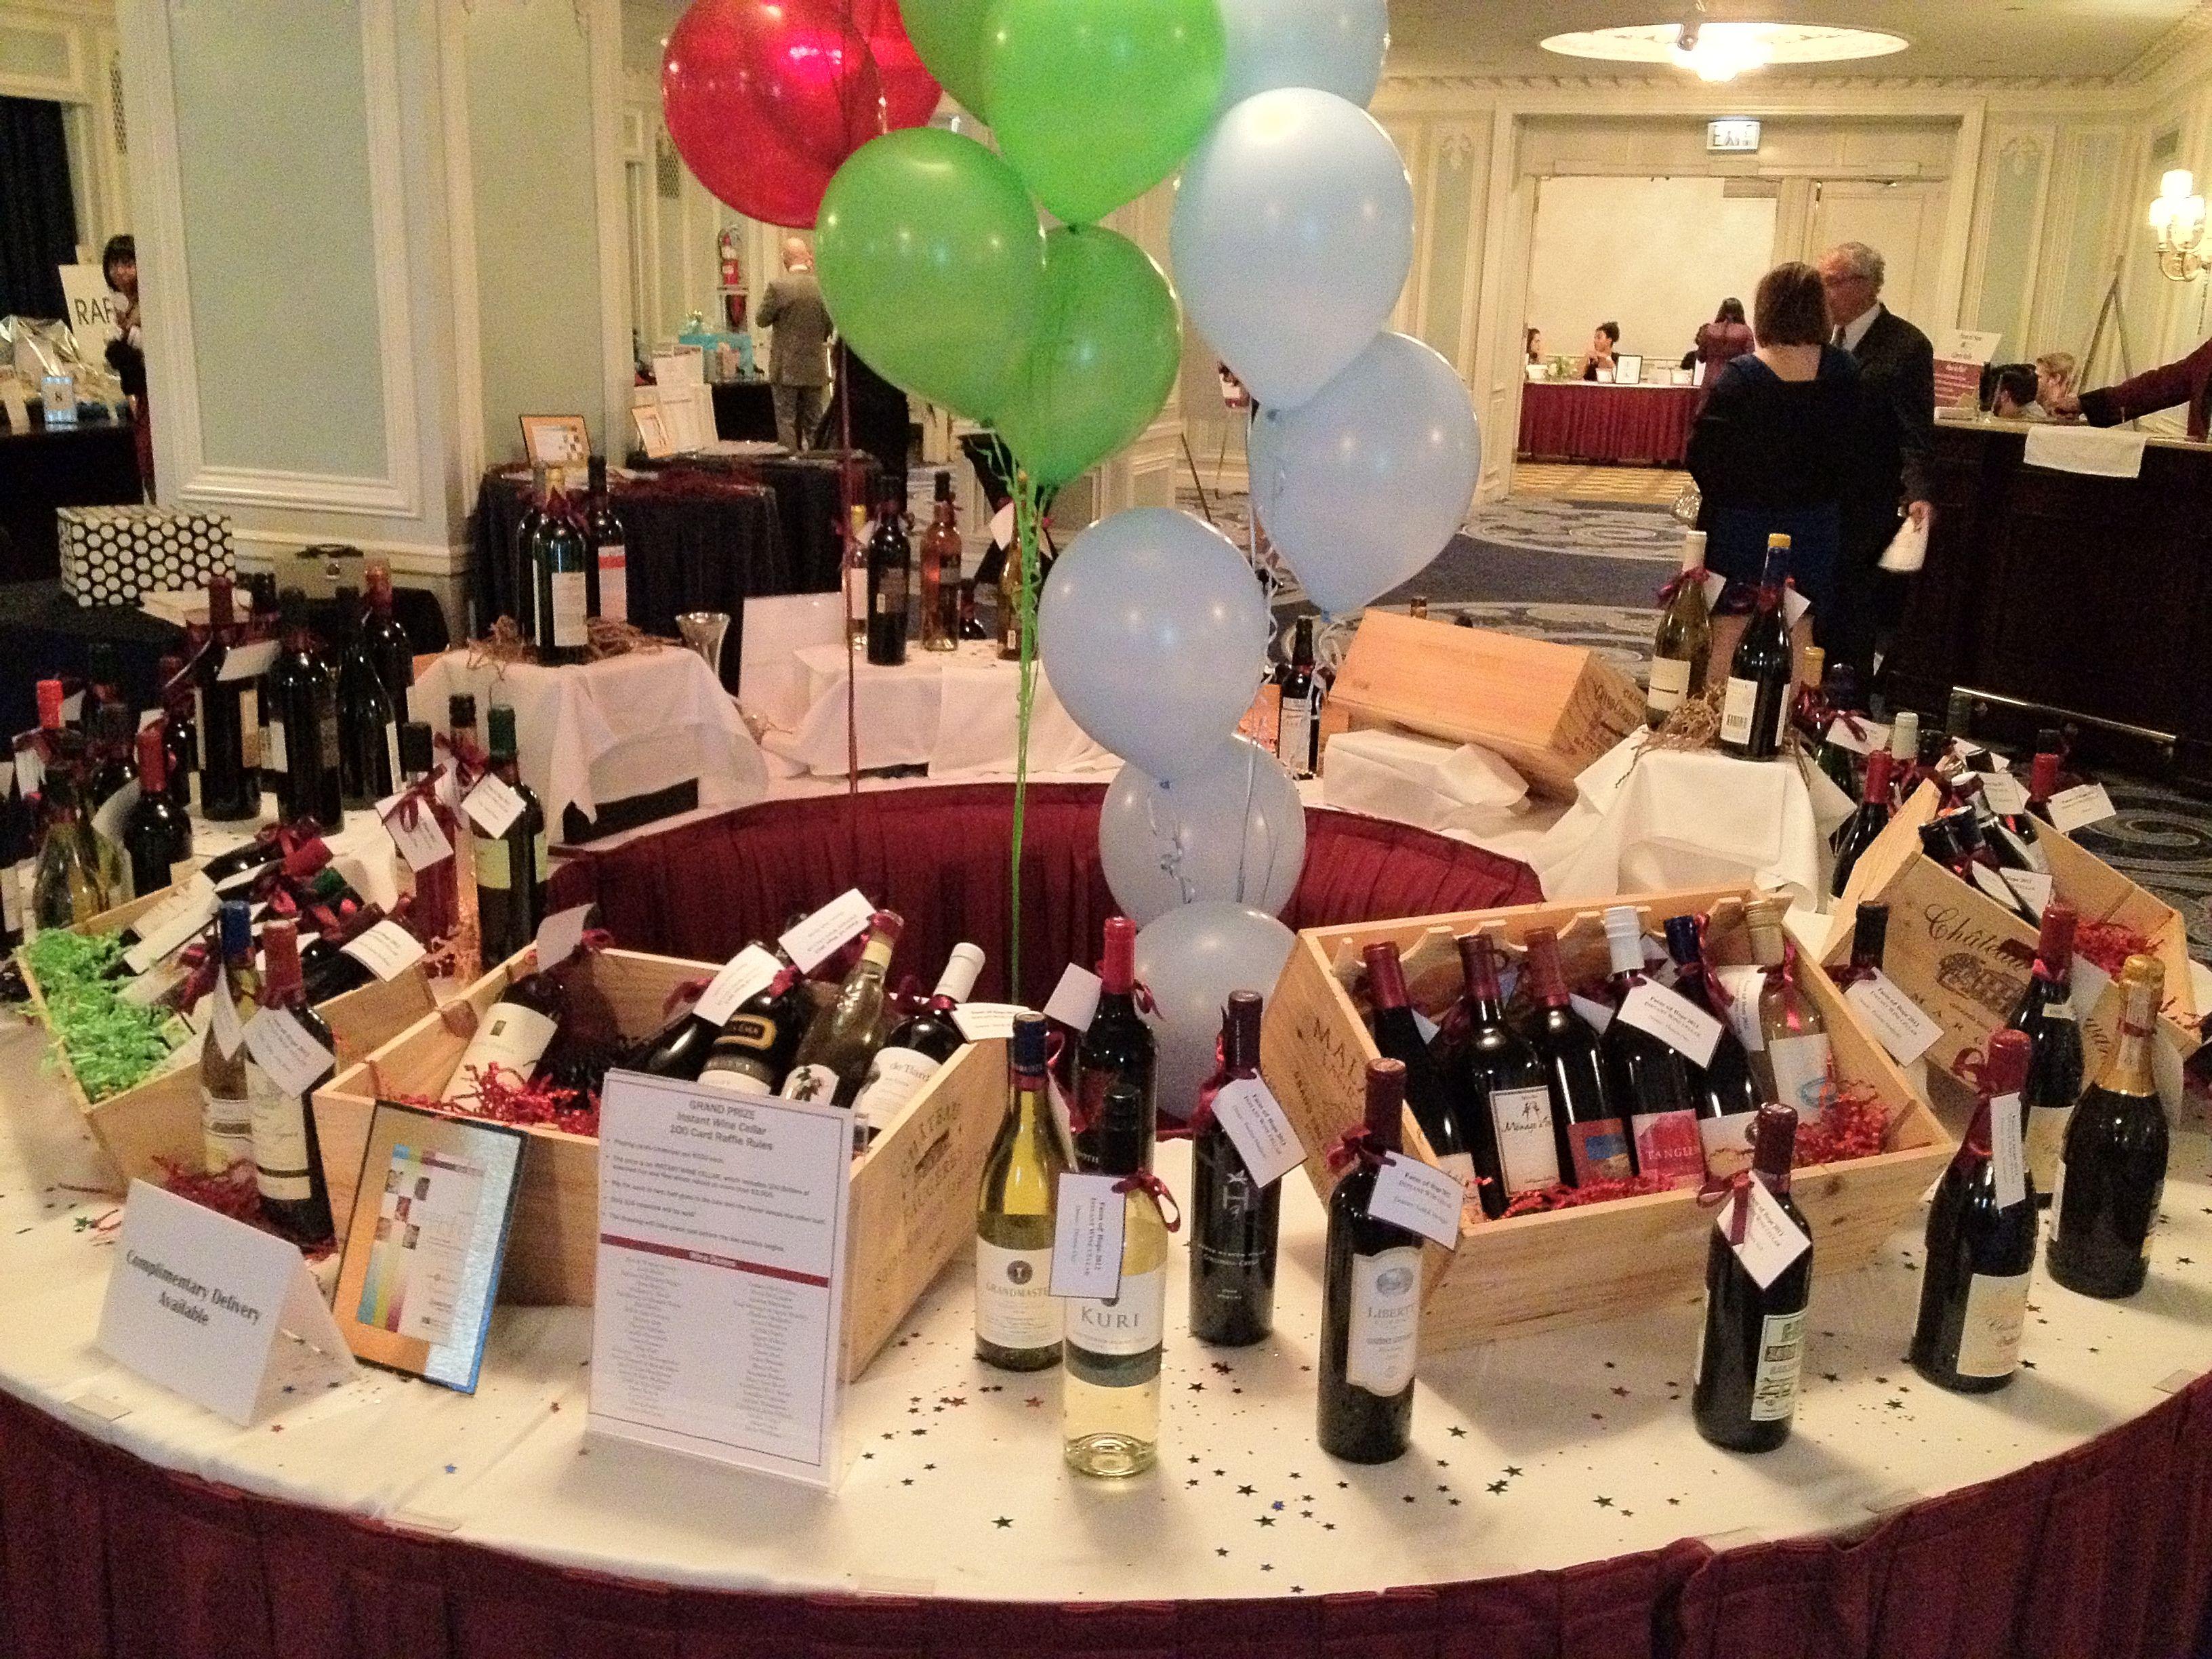 like round table display of wine